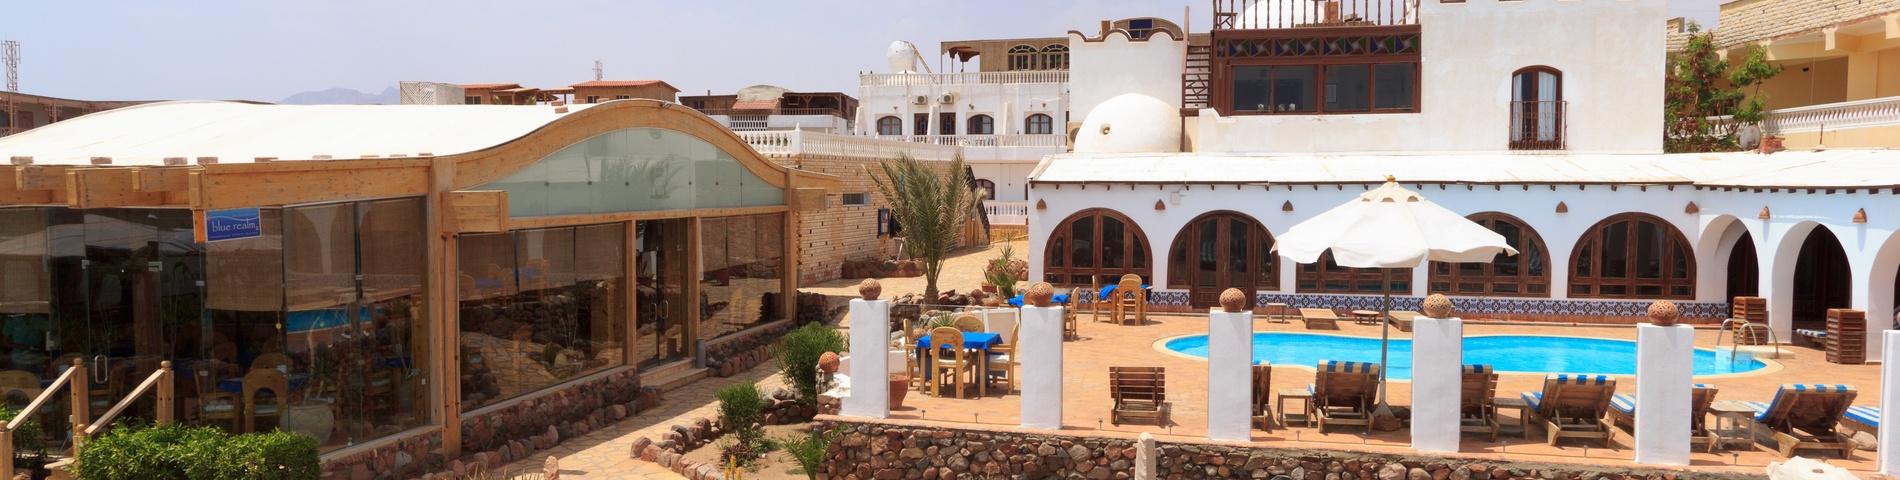 Blue Beach Club School Of Arabic Language picture 1